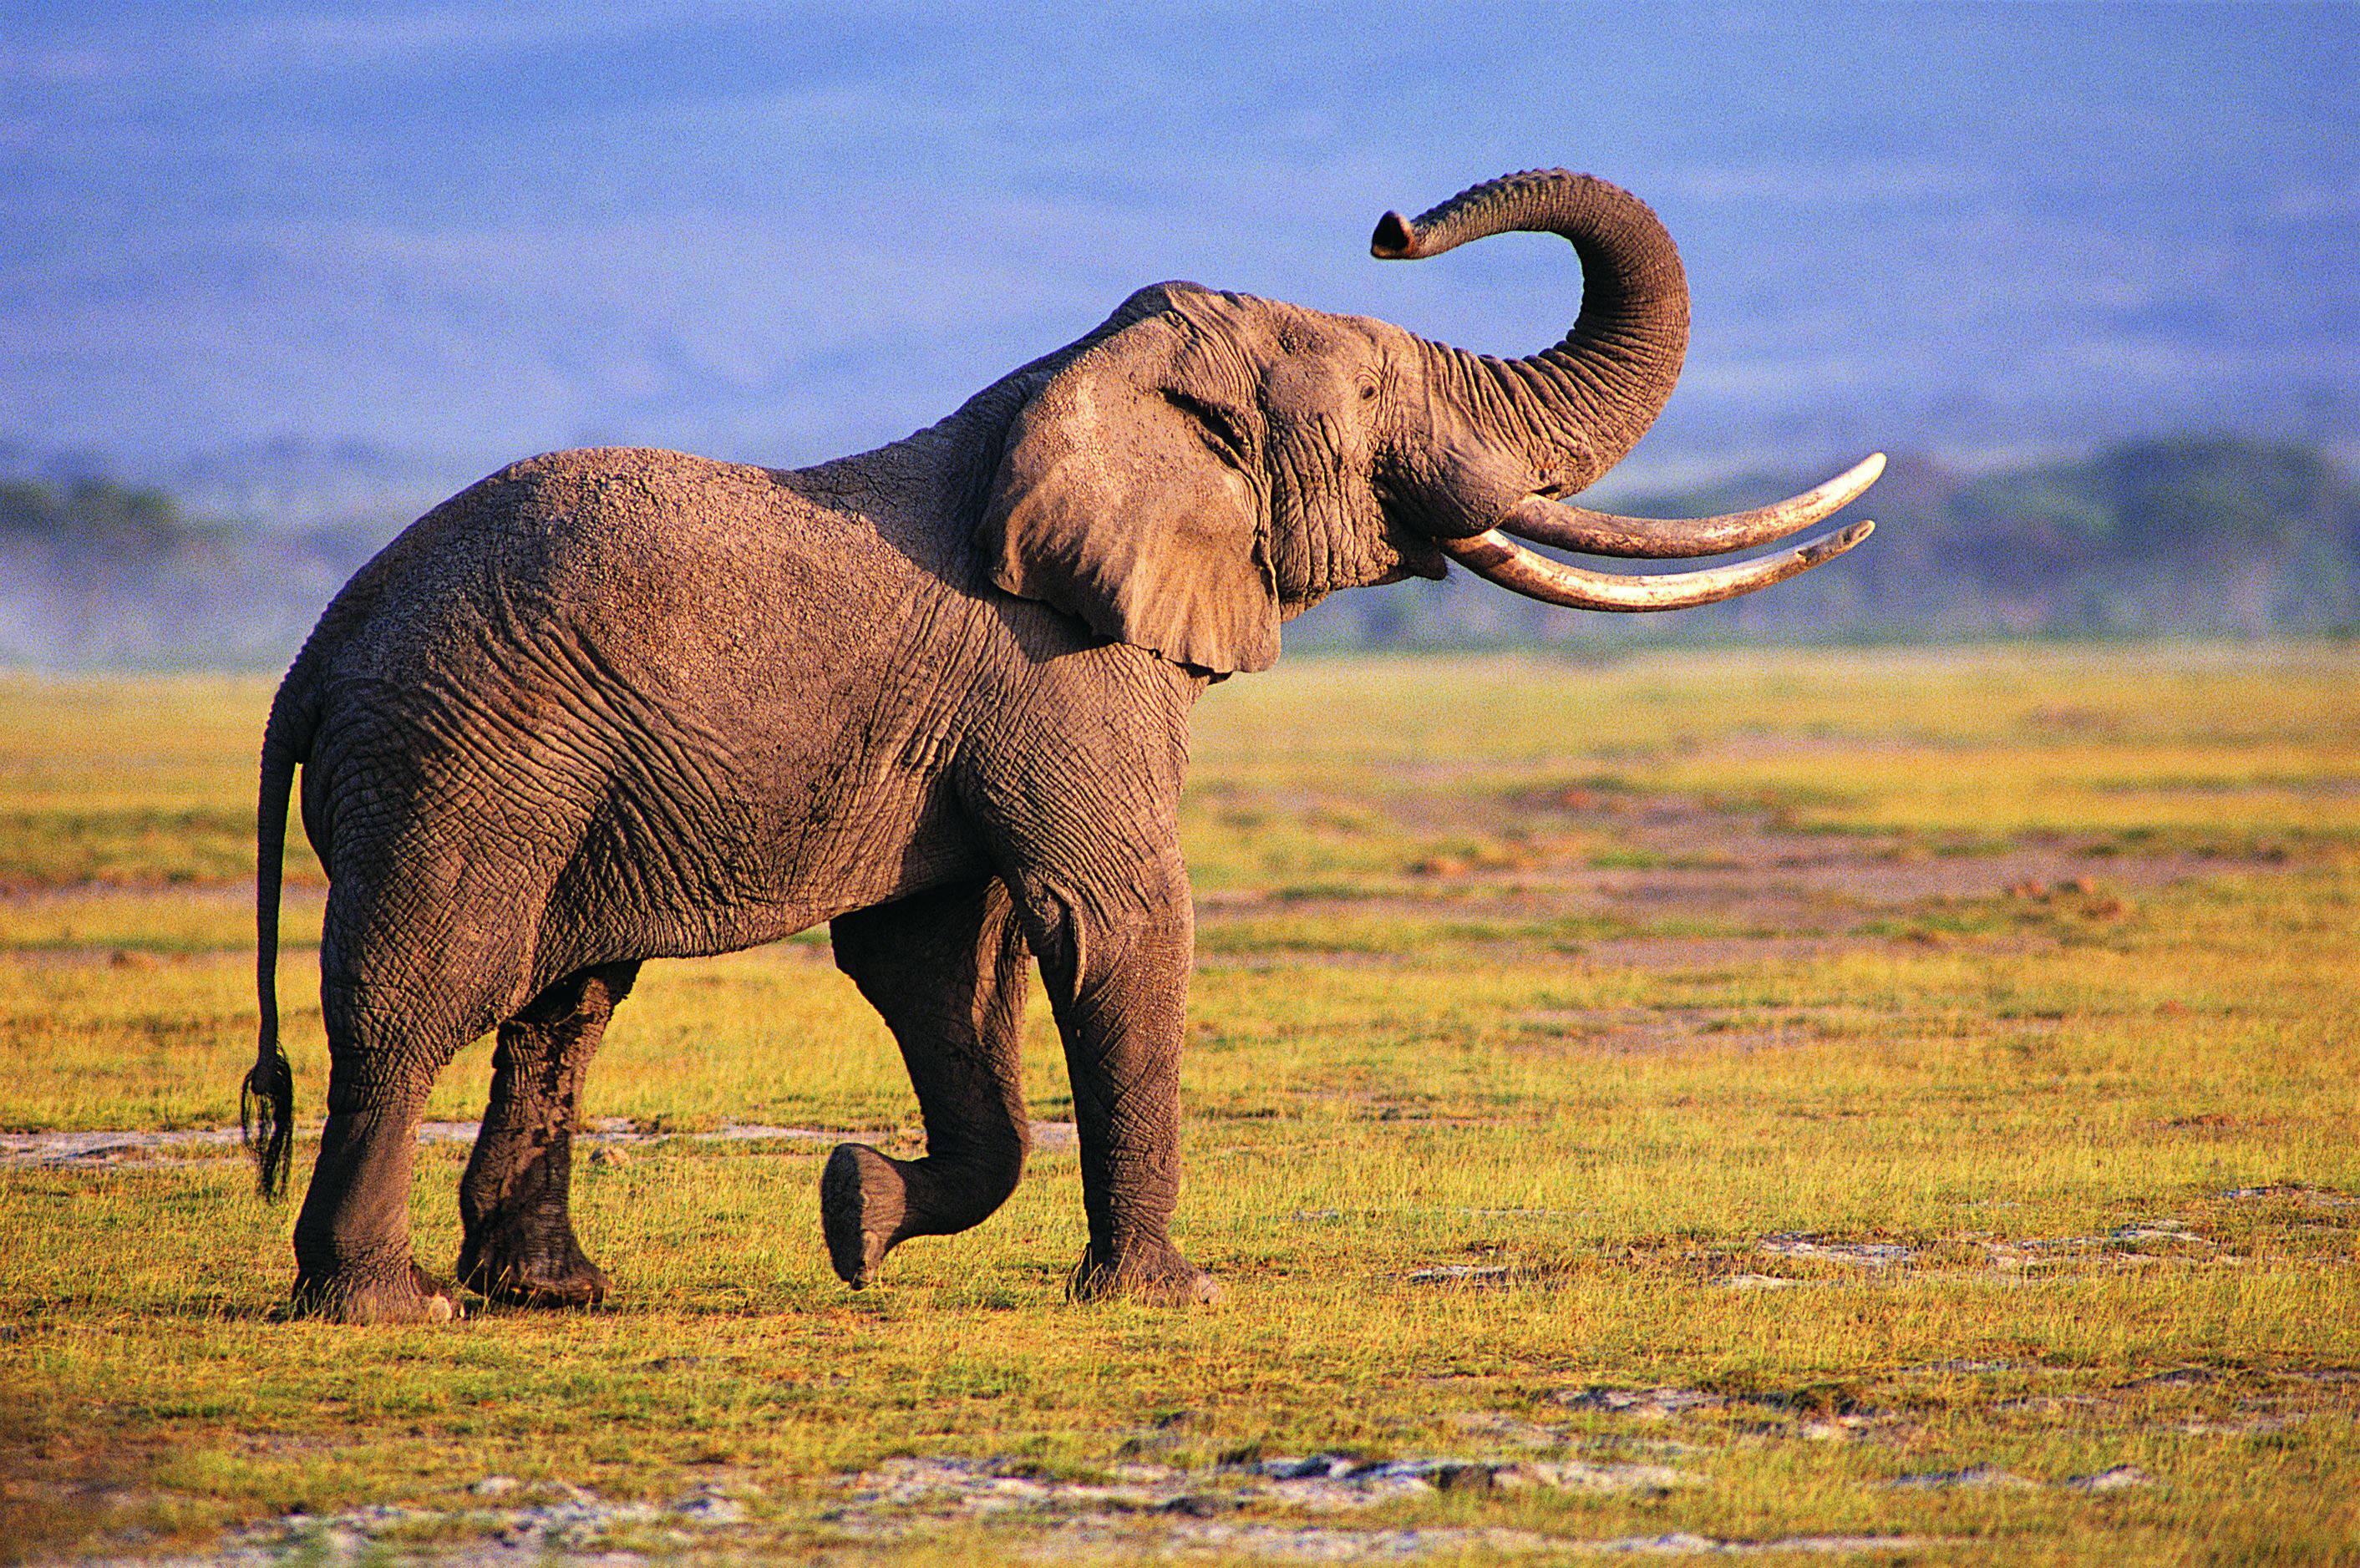 Animal Wallpaper Hd For Mobile Free Download Elephant Wallpapers Hd Pixelstalk Net